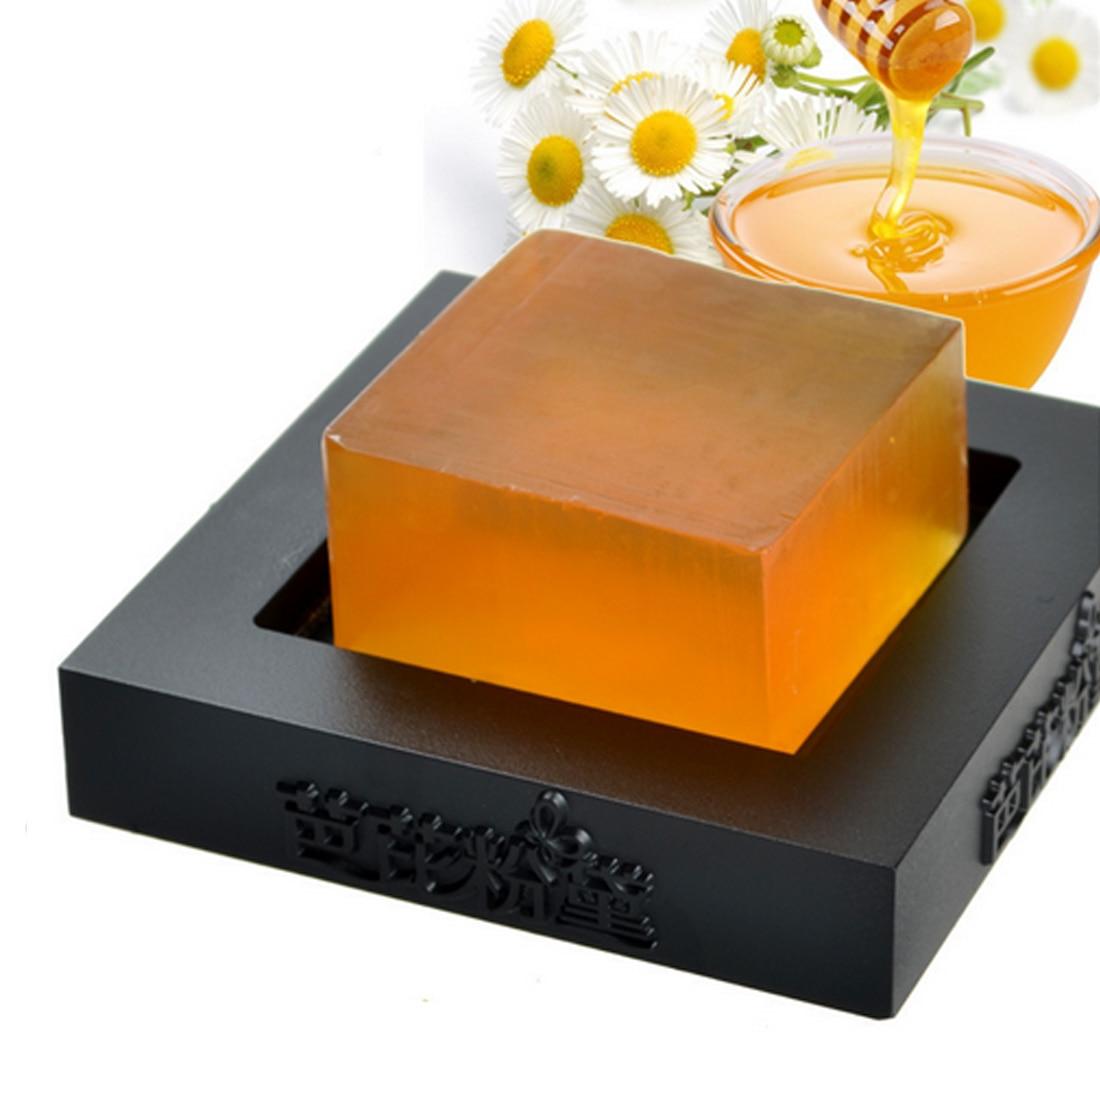 High Quality 100% HandMade Whitening Peeling Glutathione Arbutin Honey Kojic Acid Soap 100g